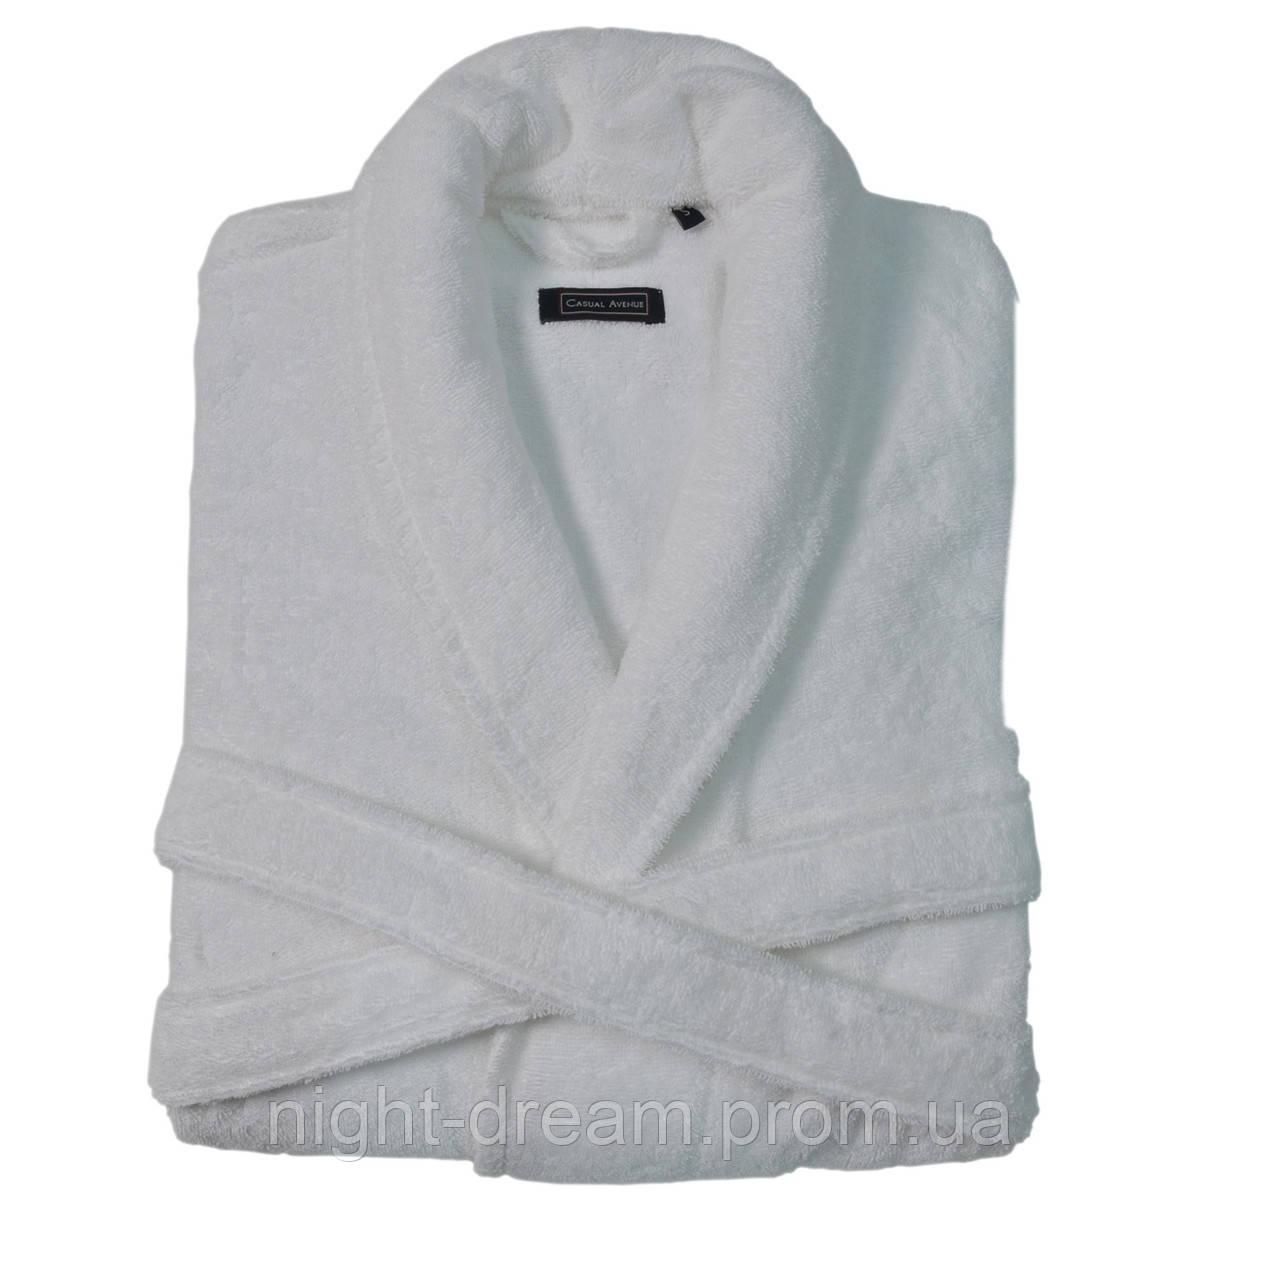 Мужской махровый халат CASUAL AVENUE Chicago белый размер M